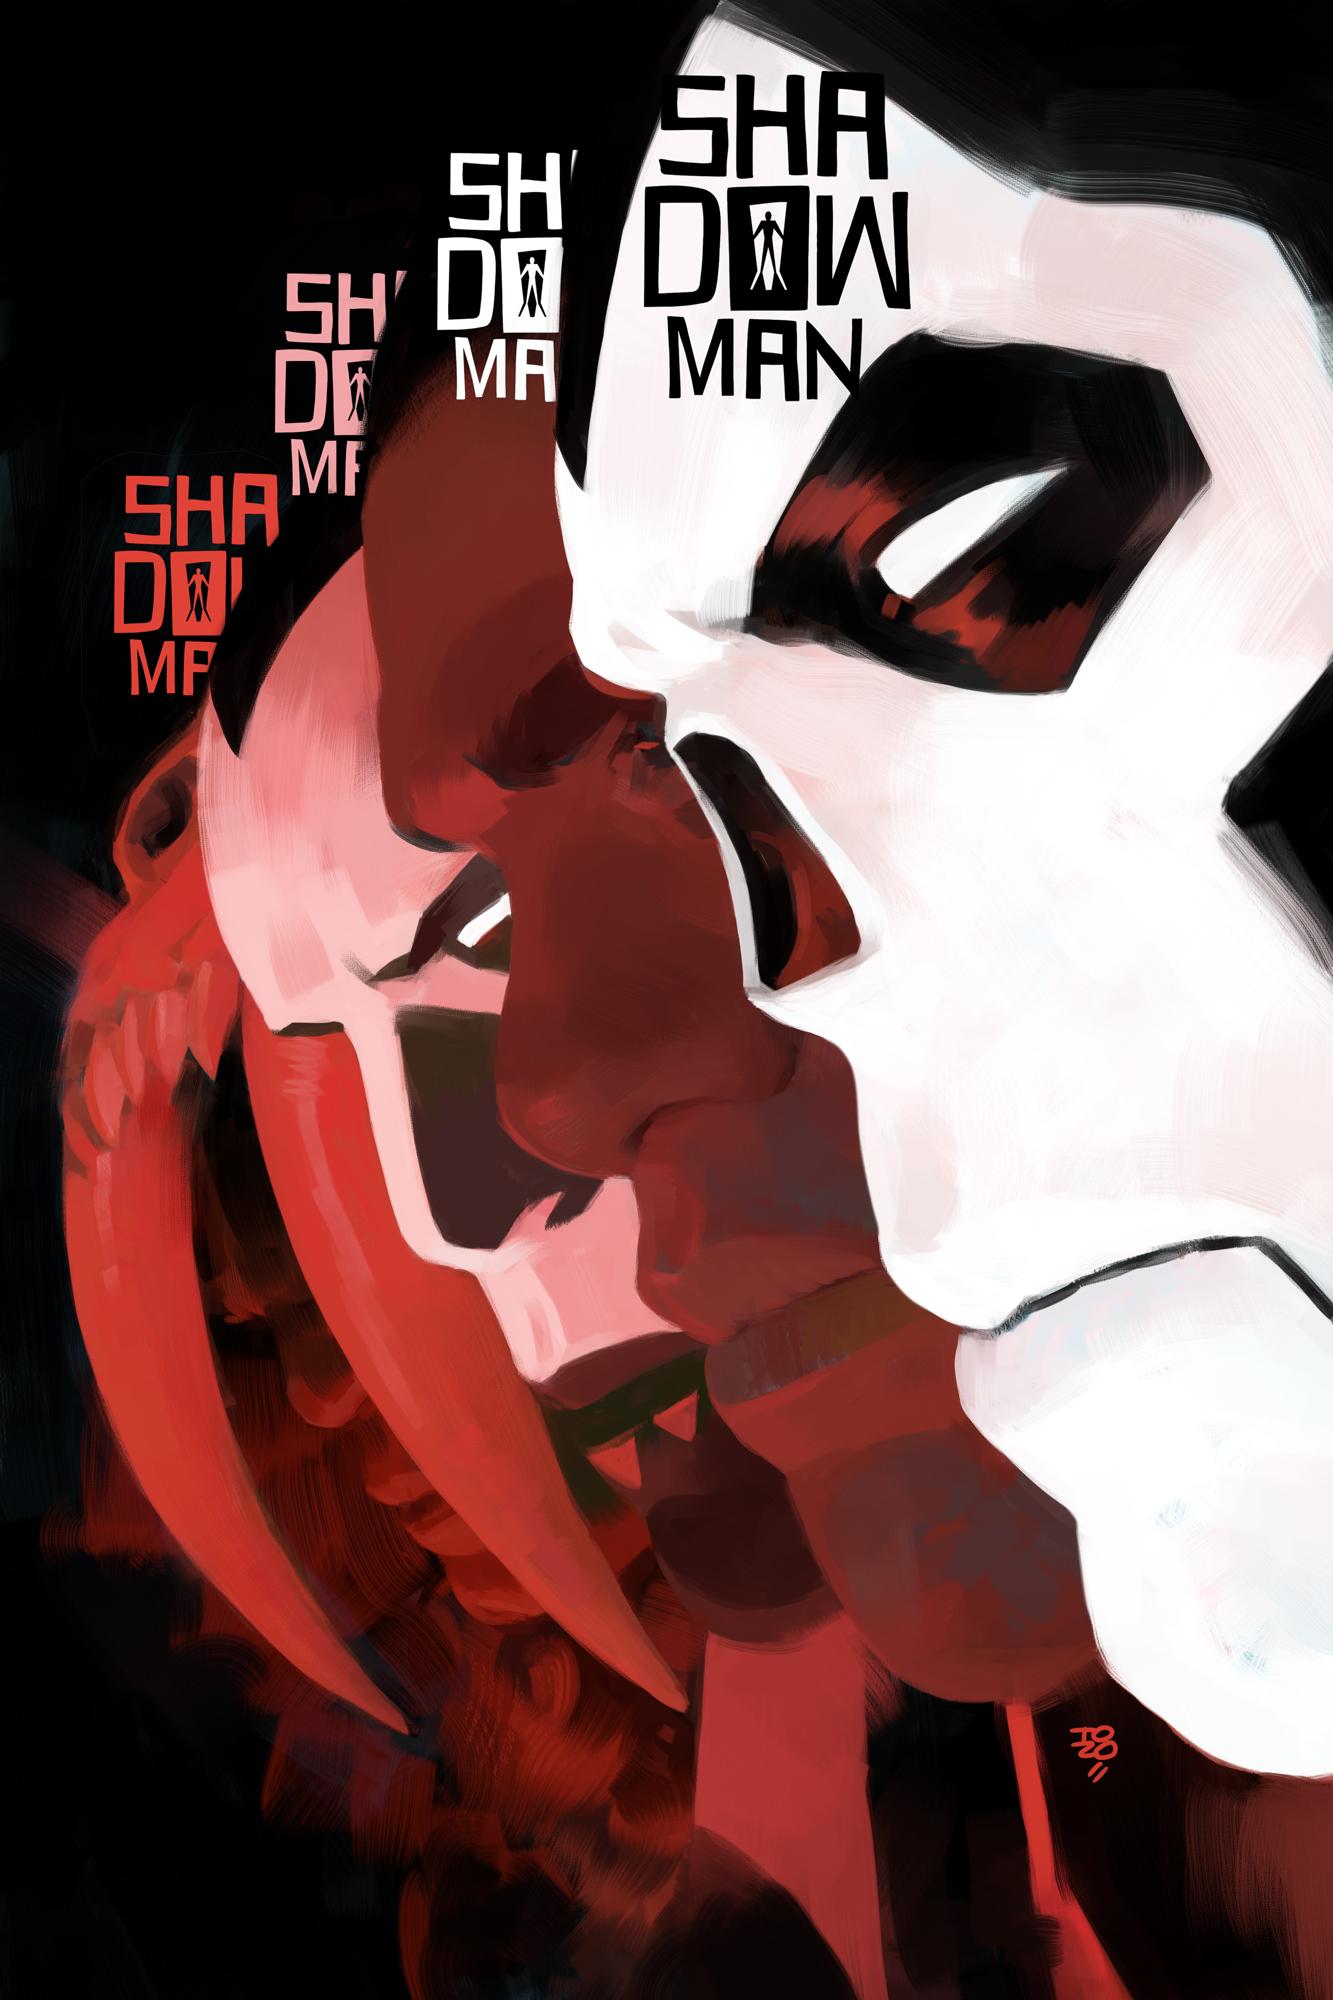 shadowman_04_fin_web.jpg